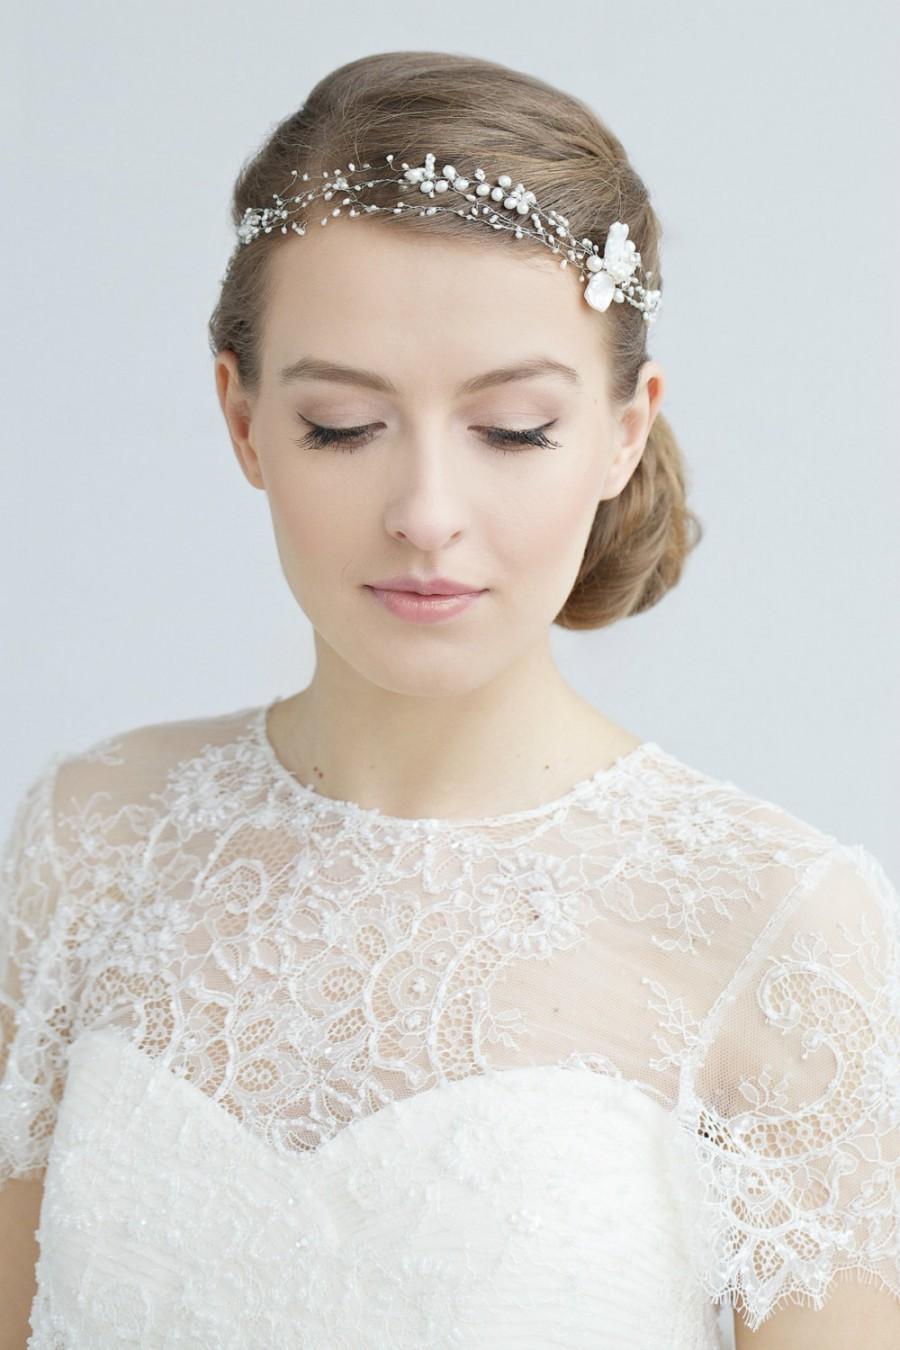 Bridal hair accessories babys breath - Bridal Pearl Headband Wedding Hair Accessory Wedding Pearl Headband Baby S Breath Hair Piece Wedding Bohemian Headpiece